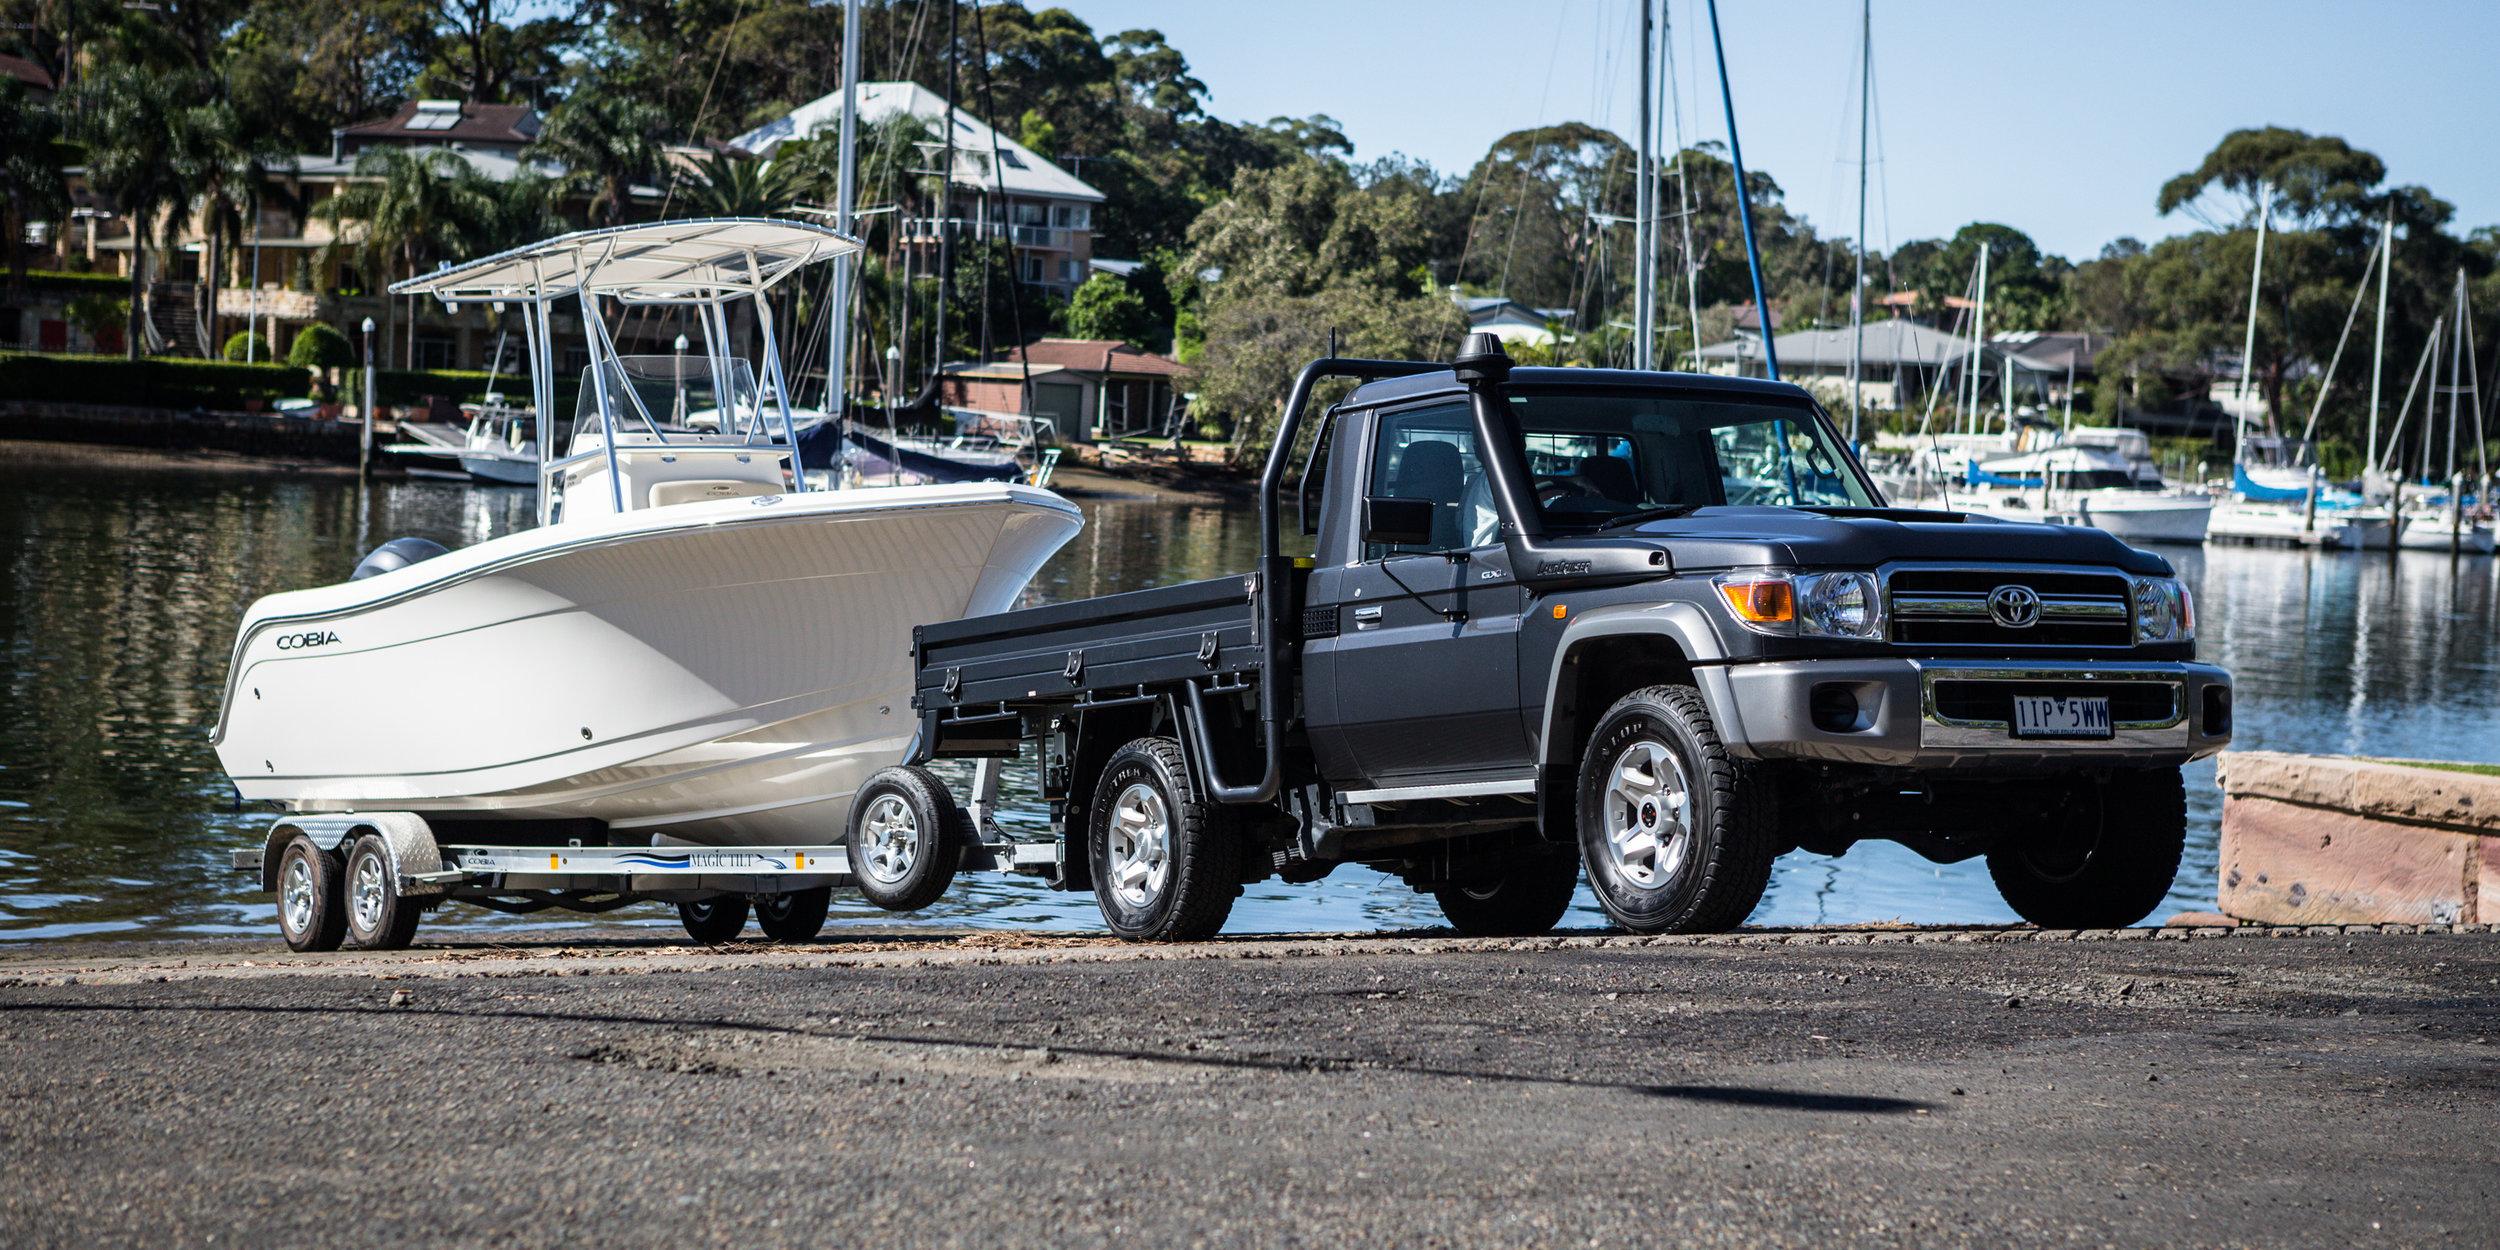 2017-Toyota-LC-Single-Cab-LT-Boat-Tow-7.jpg